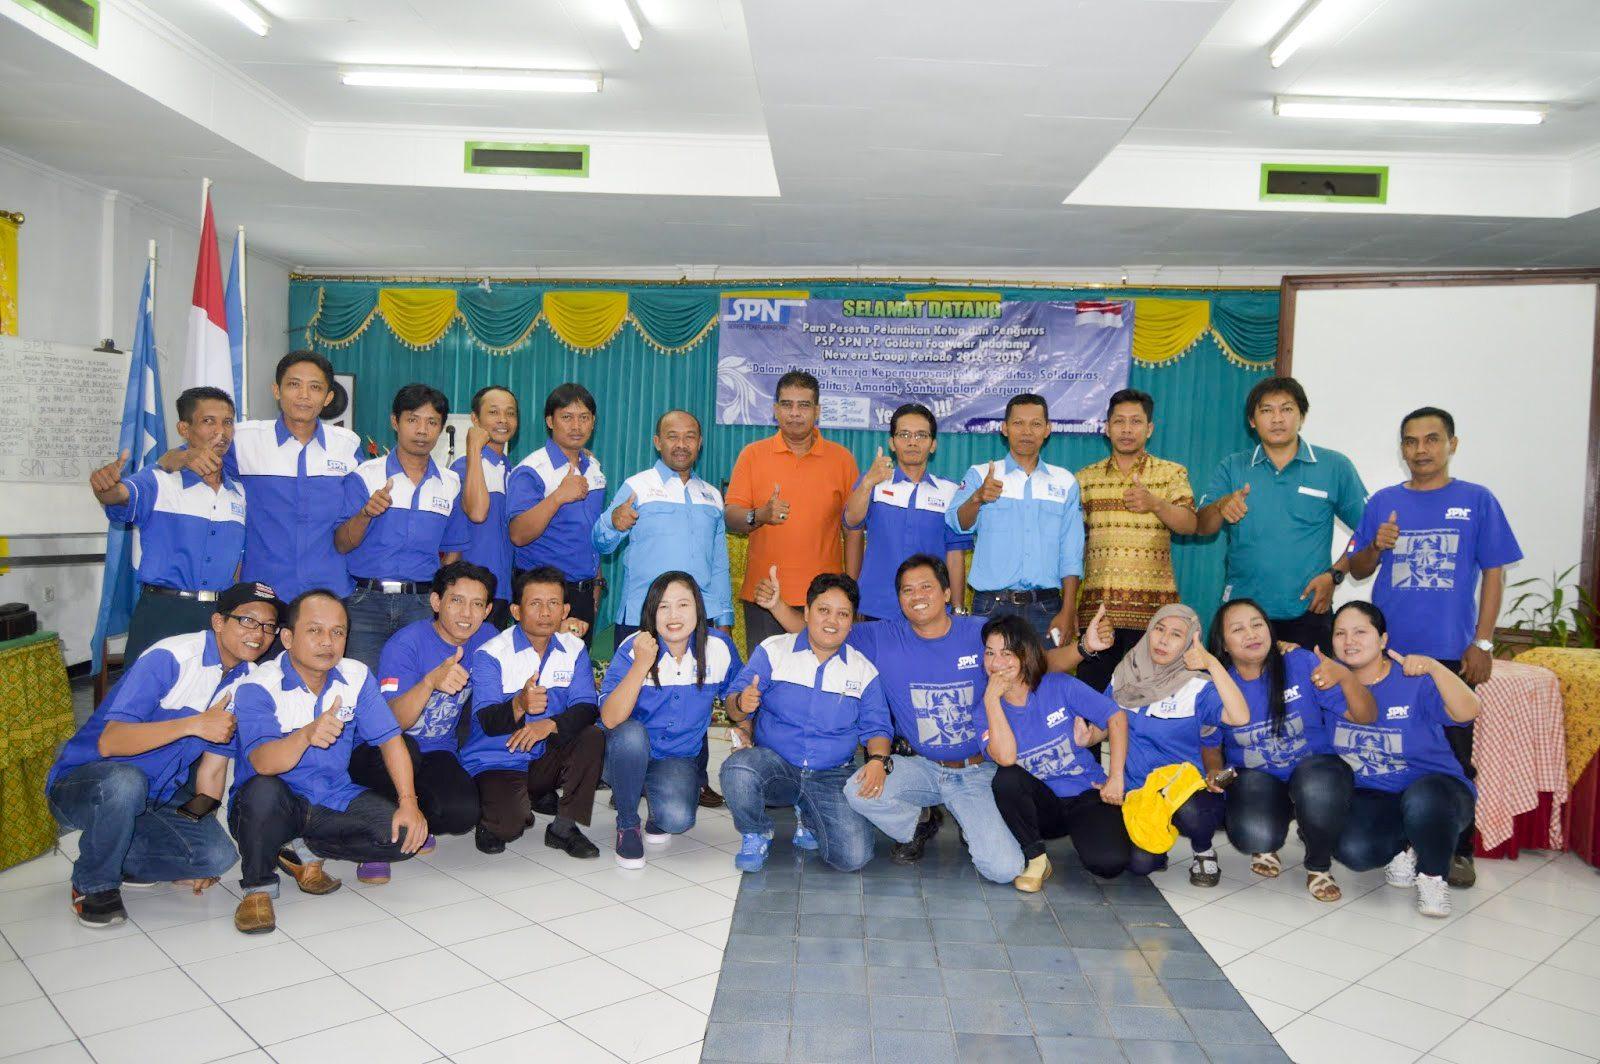 Pelantikan Pengurus PSP SPN PT Golden Footwear Indotama